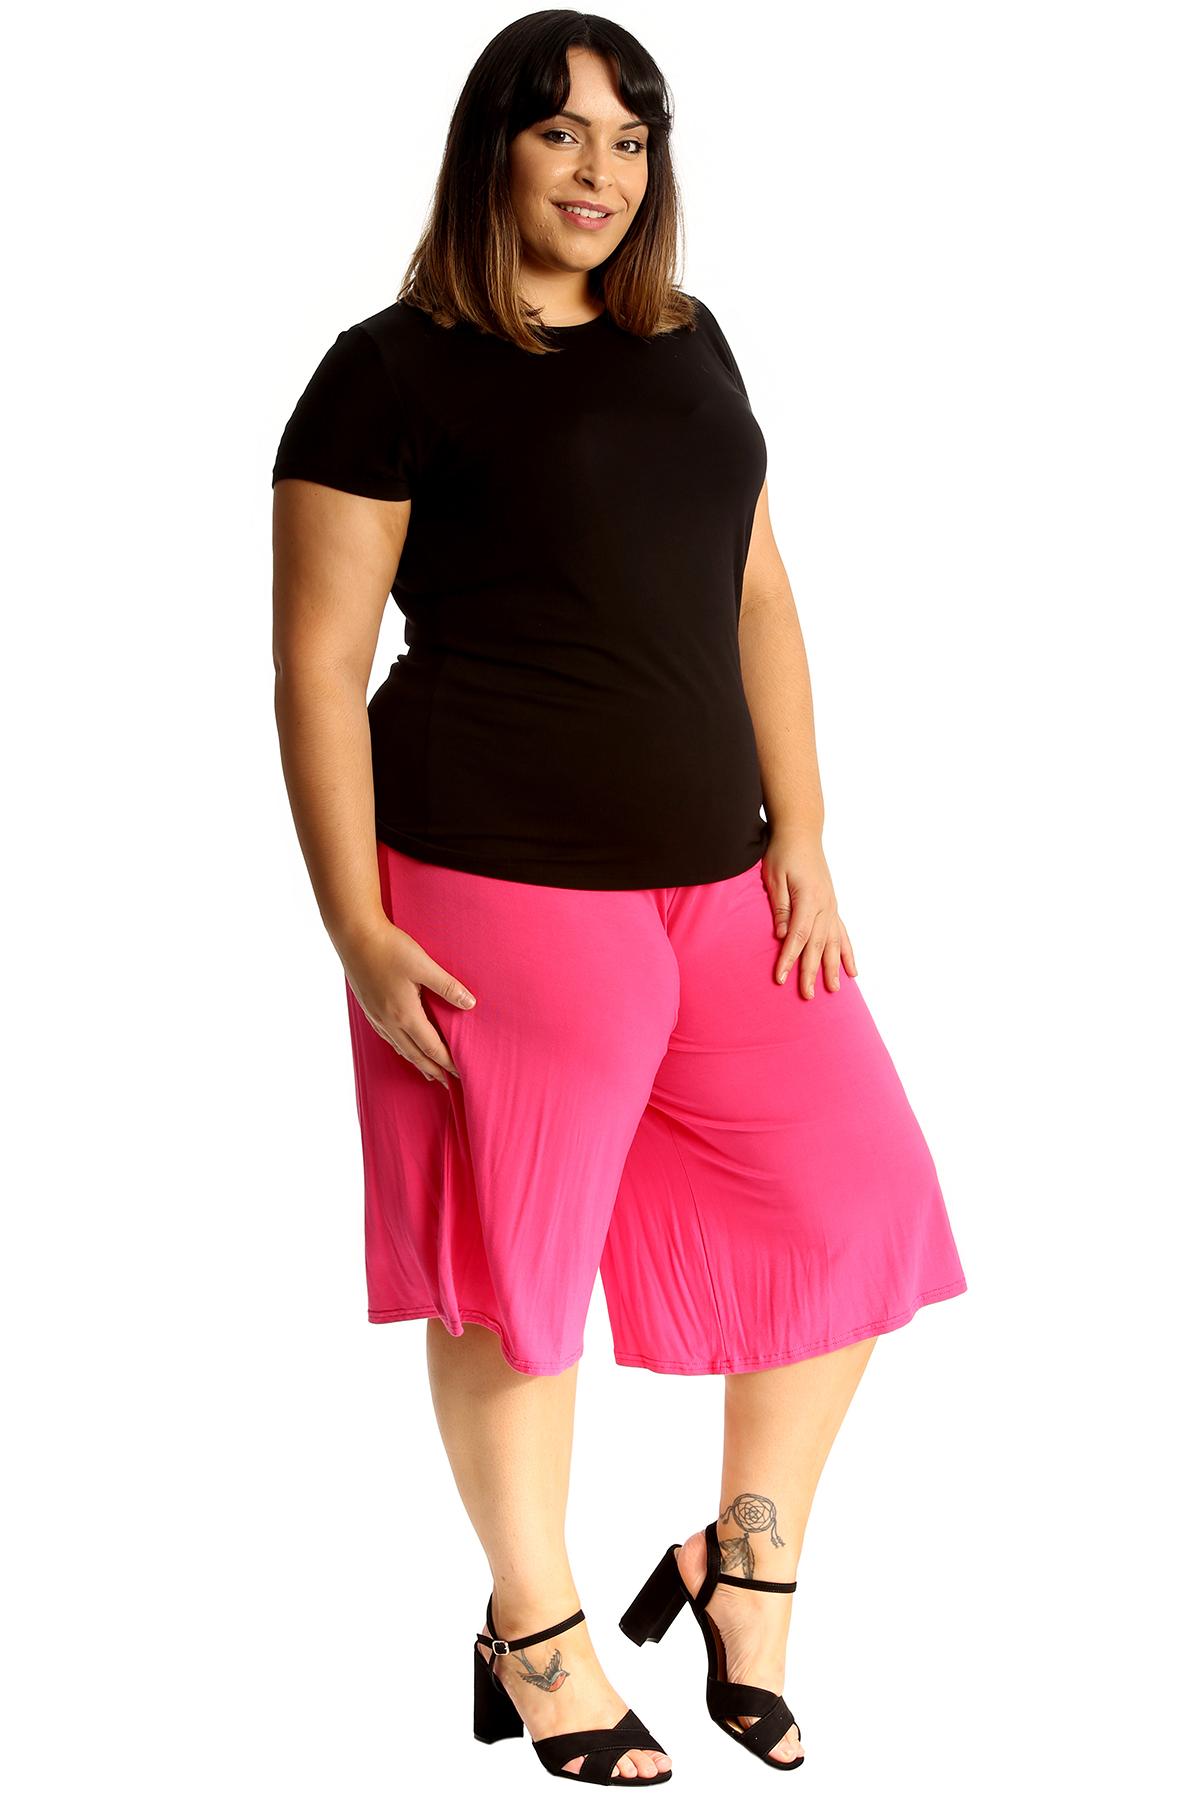 New-Womens-Plus-Size-Culottes-Ladies-Plain-Shorts-Palazzo-Elastic-Pants-Summer thumbnail 19